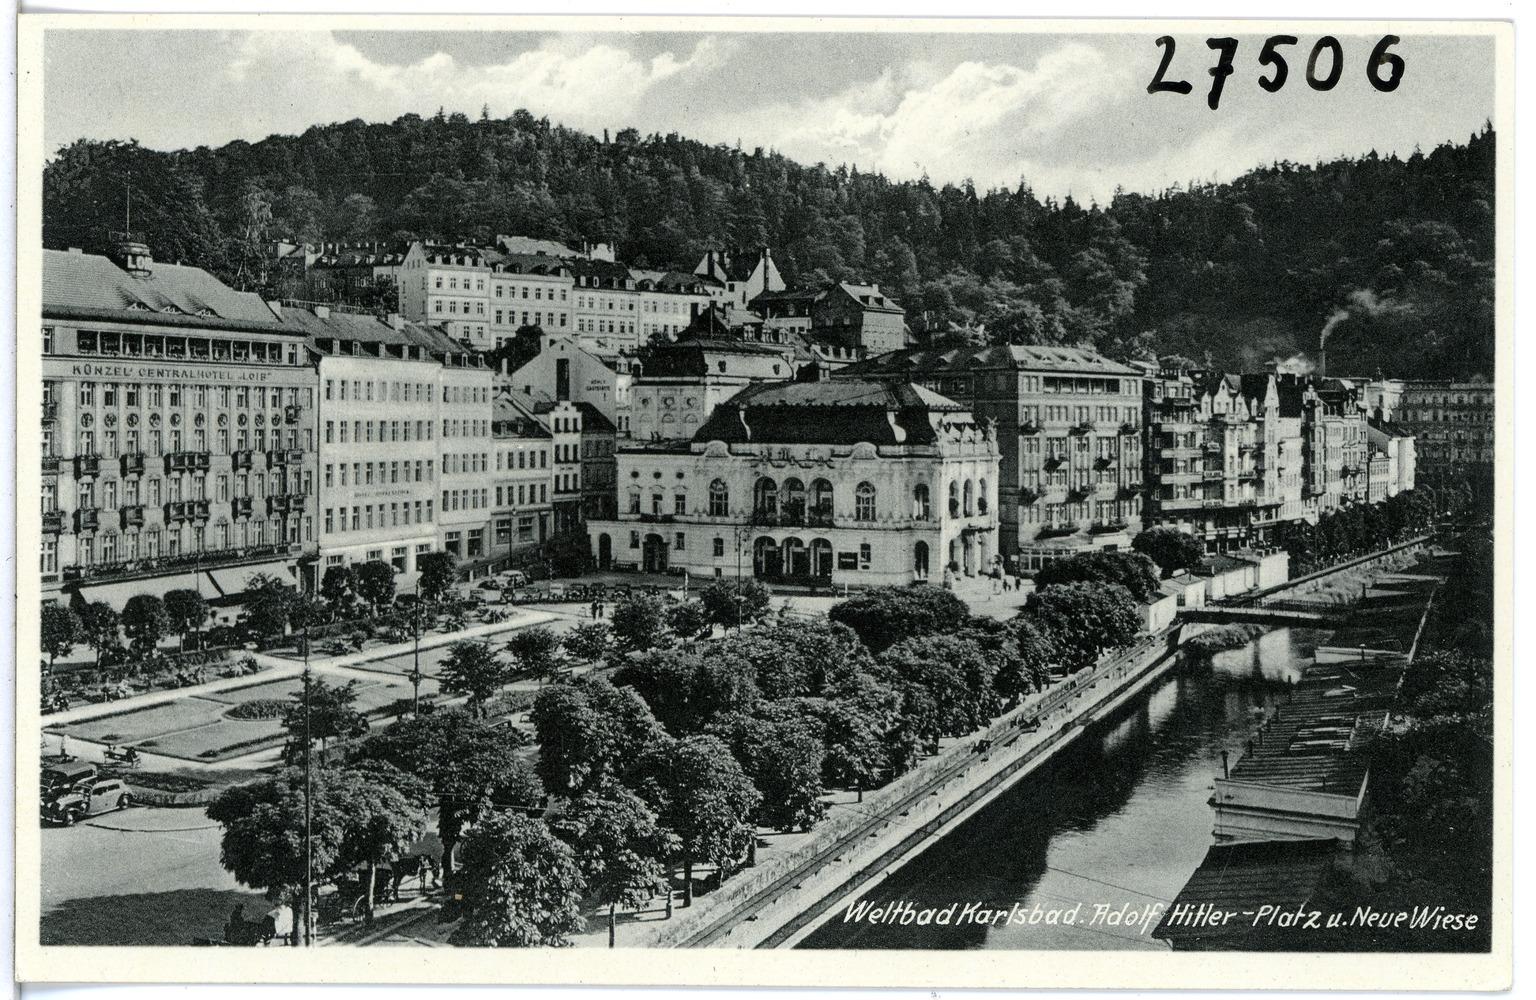 La place Adolf Hitler à Karlovy Vary, 1939, photo: Brück ' Sohn Kunstverlag Meißen, CC BY-SA 3.0